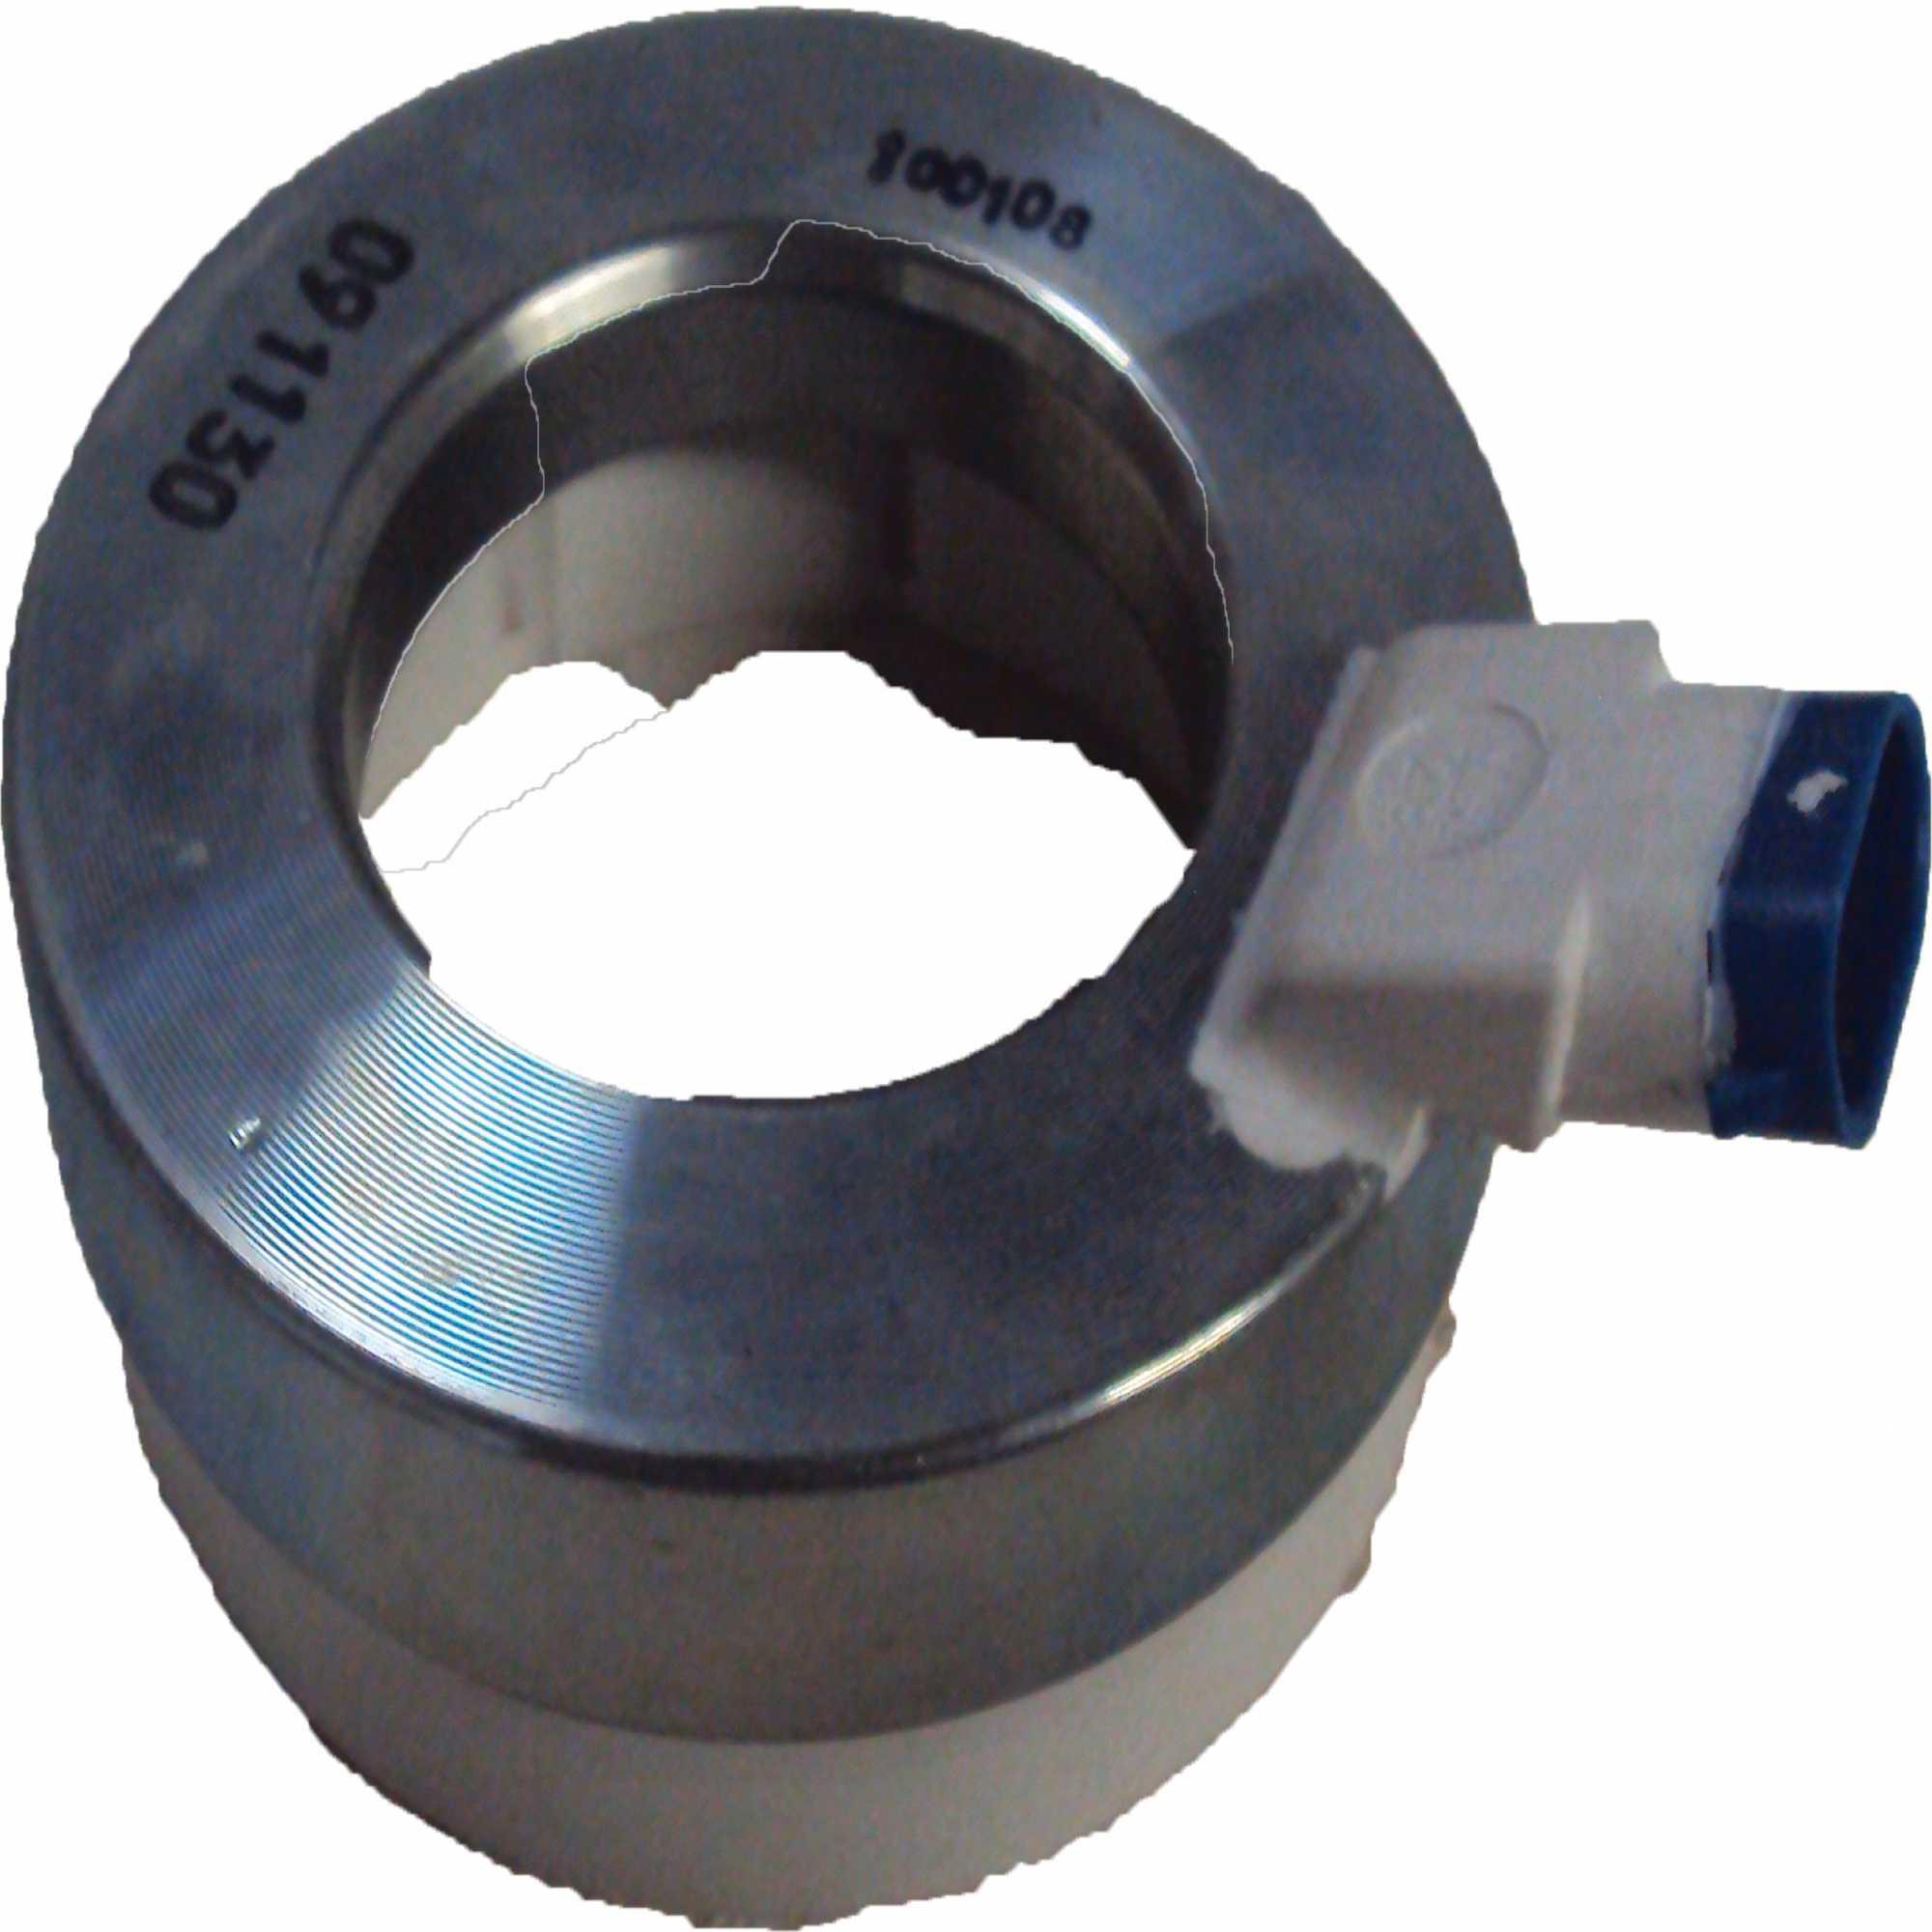 Bobina Compressor - S10 V6/silverado 4/6Cc Diesel